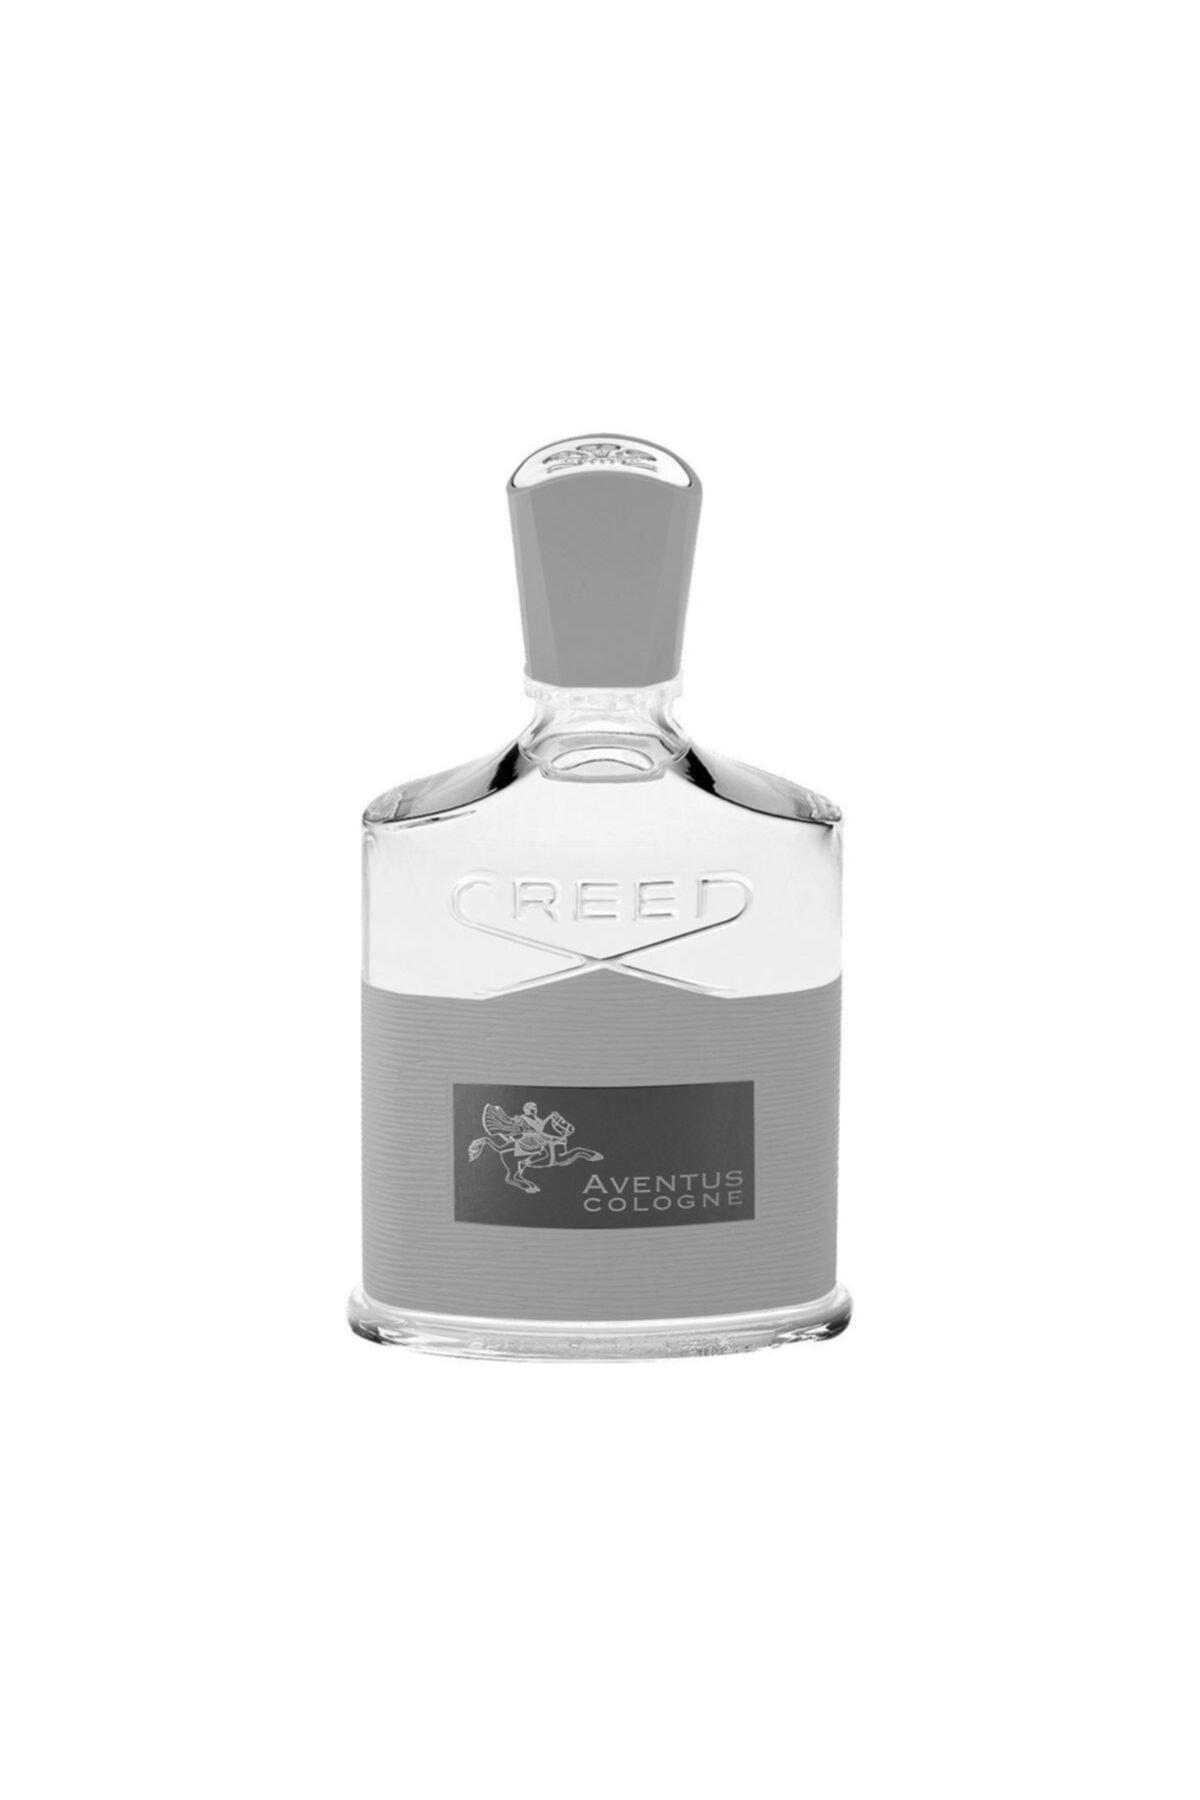 Creed Aventus Cologne Edp 100 ml Erkek Parfüm 3508441001275 1